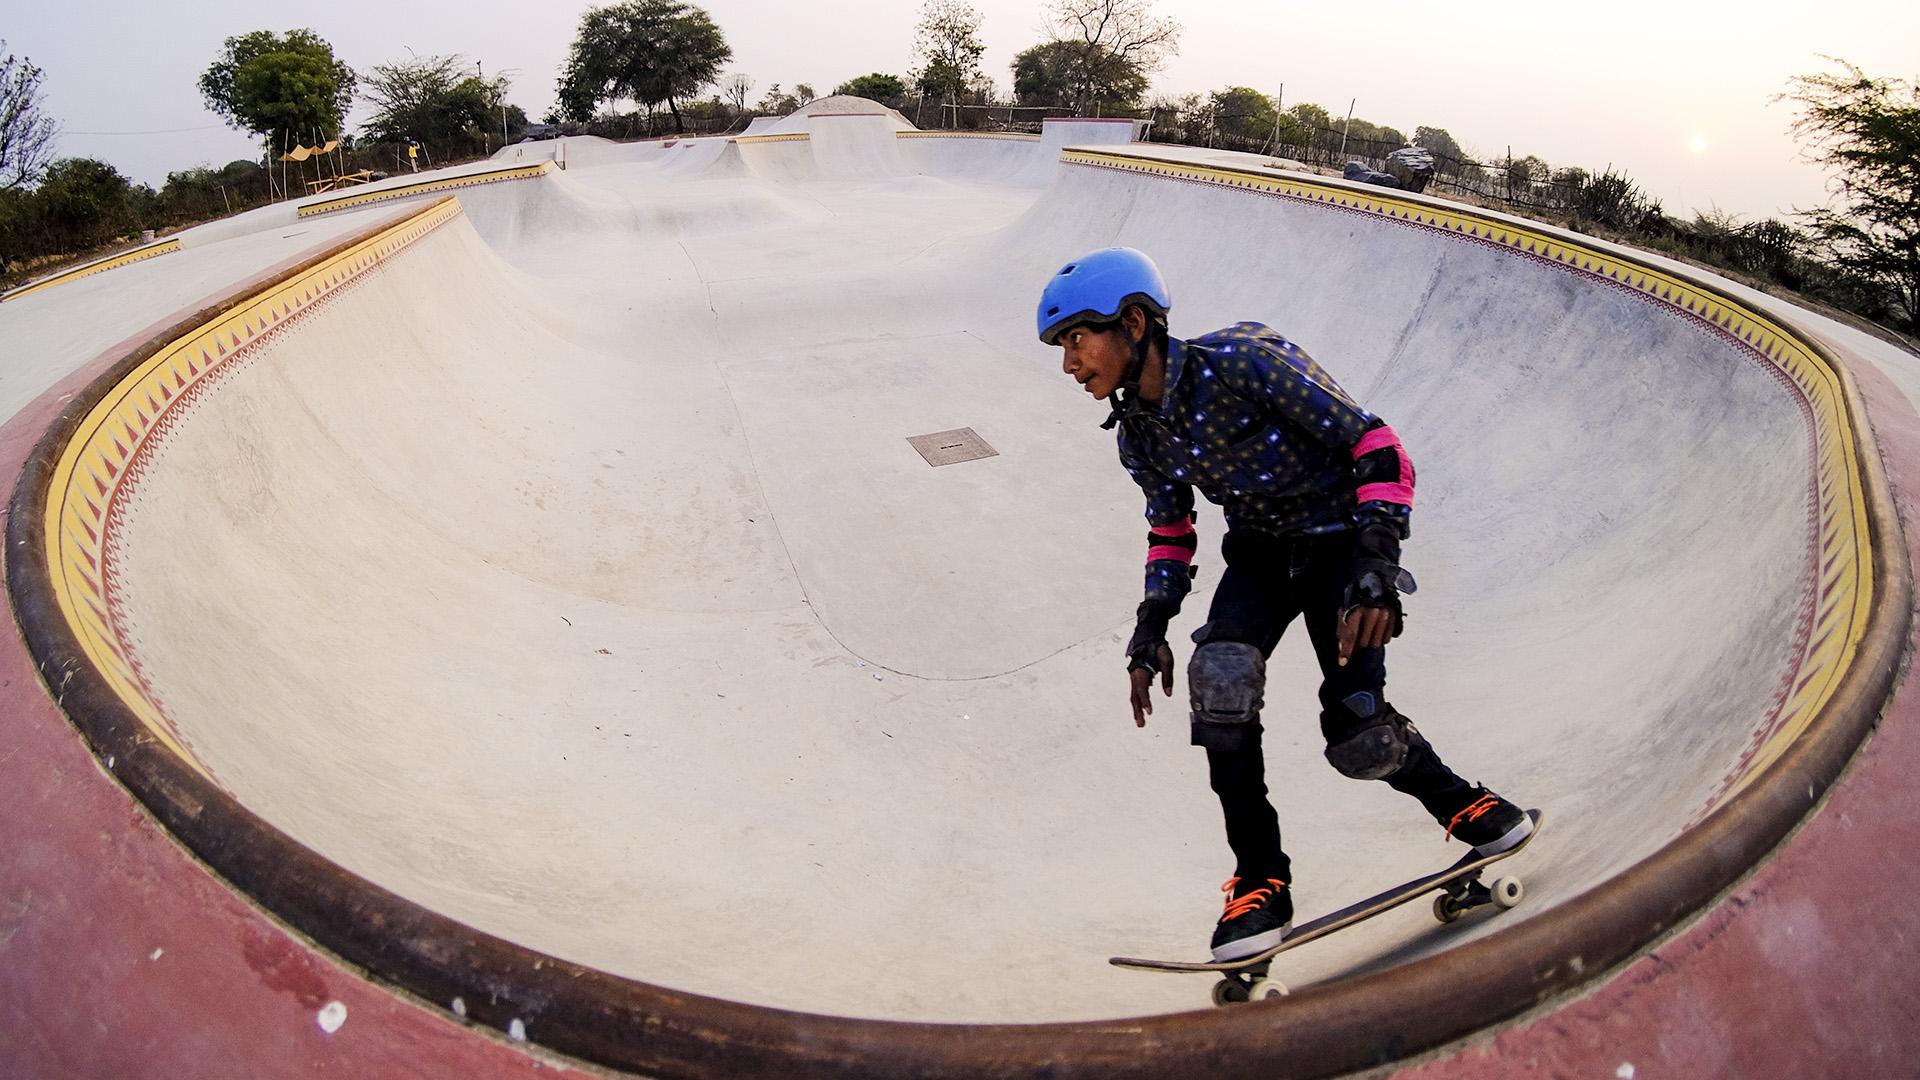 Netflix Movie's Skate Park Set Now Training Ground For Indian Village Kids